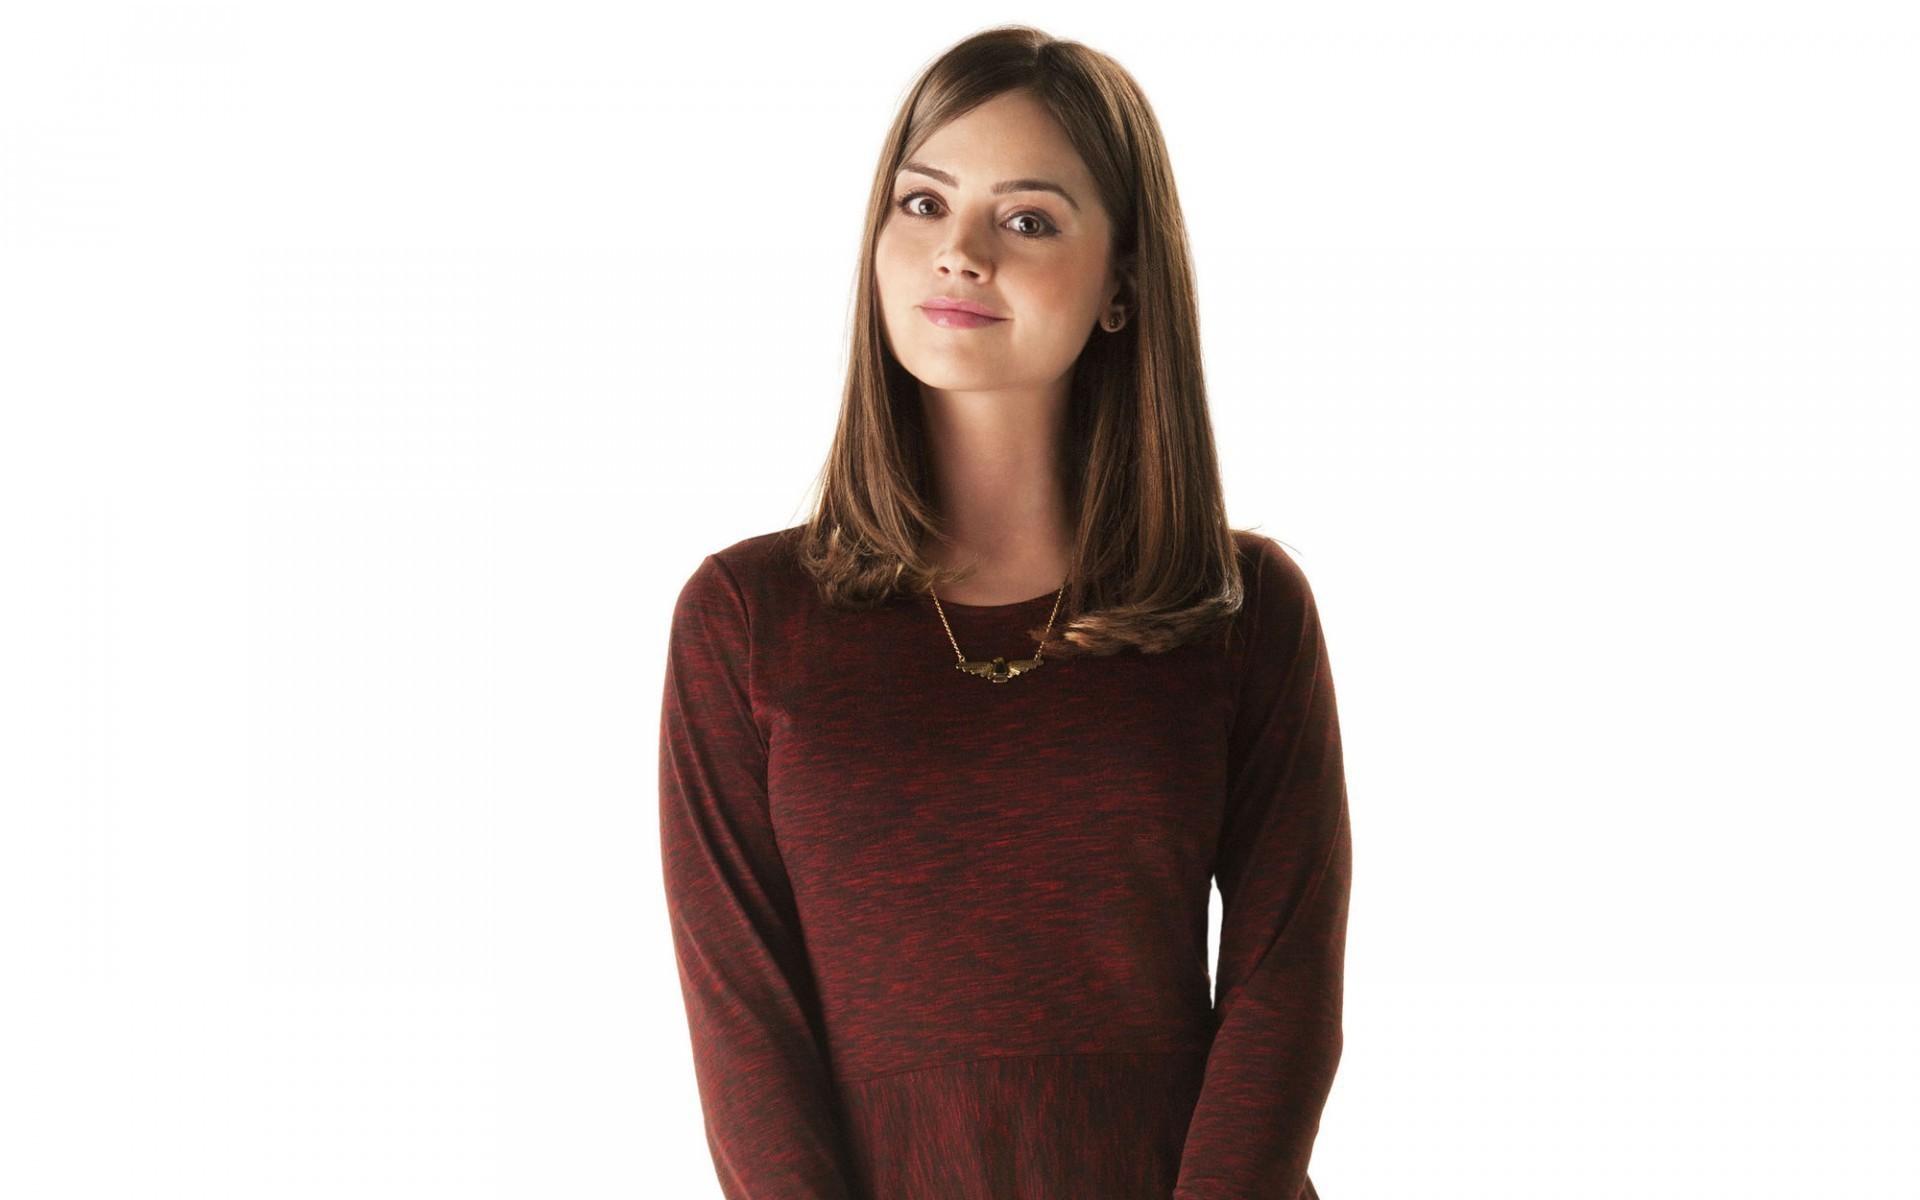 Jenna Coleman Toples